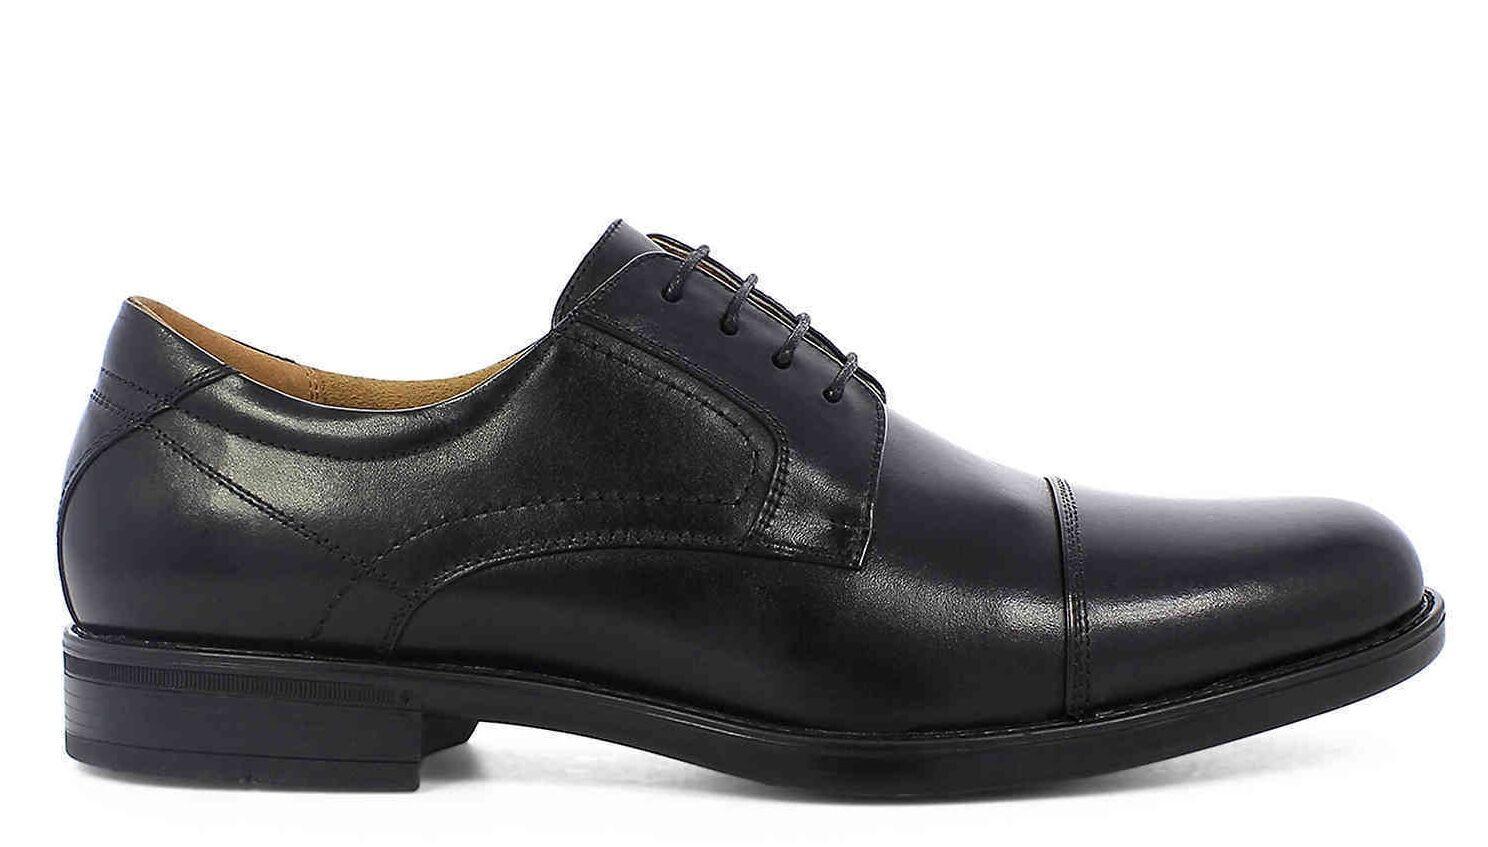 Florsheim Mens Midtown Cap Toe Black Mens Florsheim Oxford Shoes [12138 001] e4194a